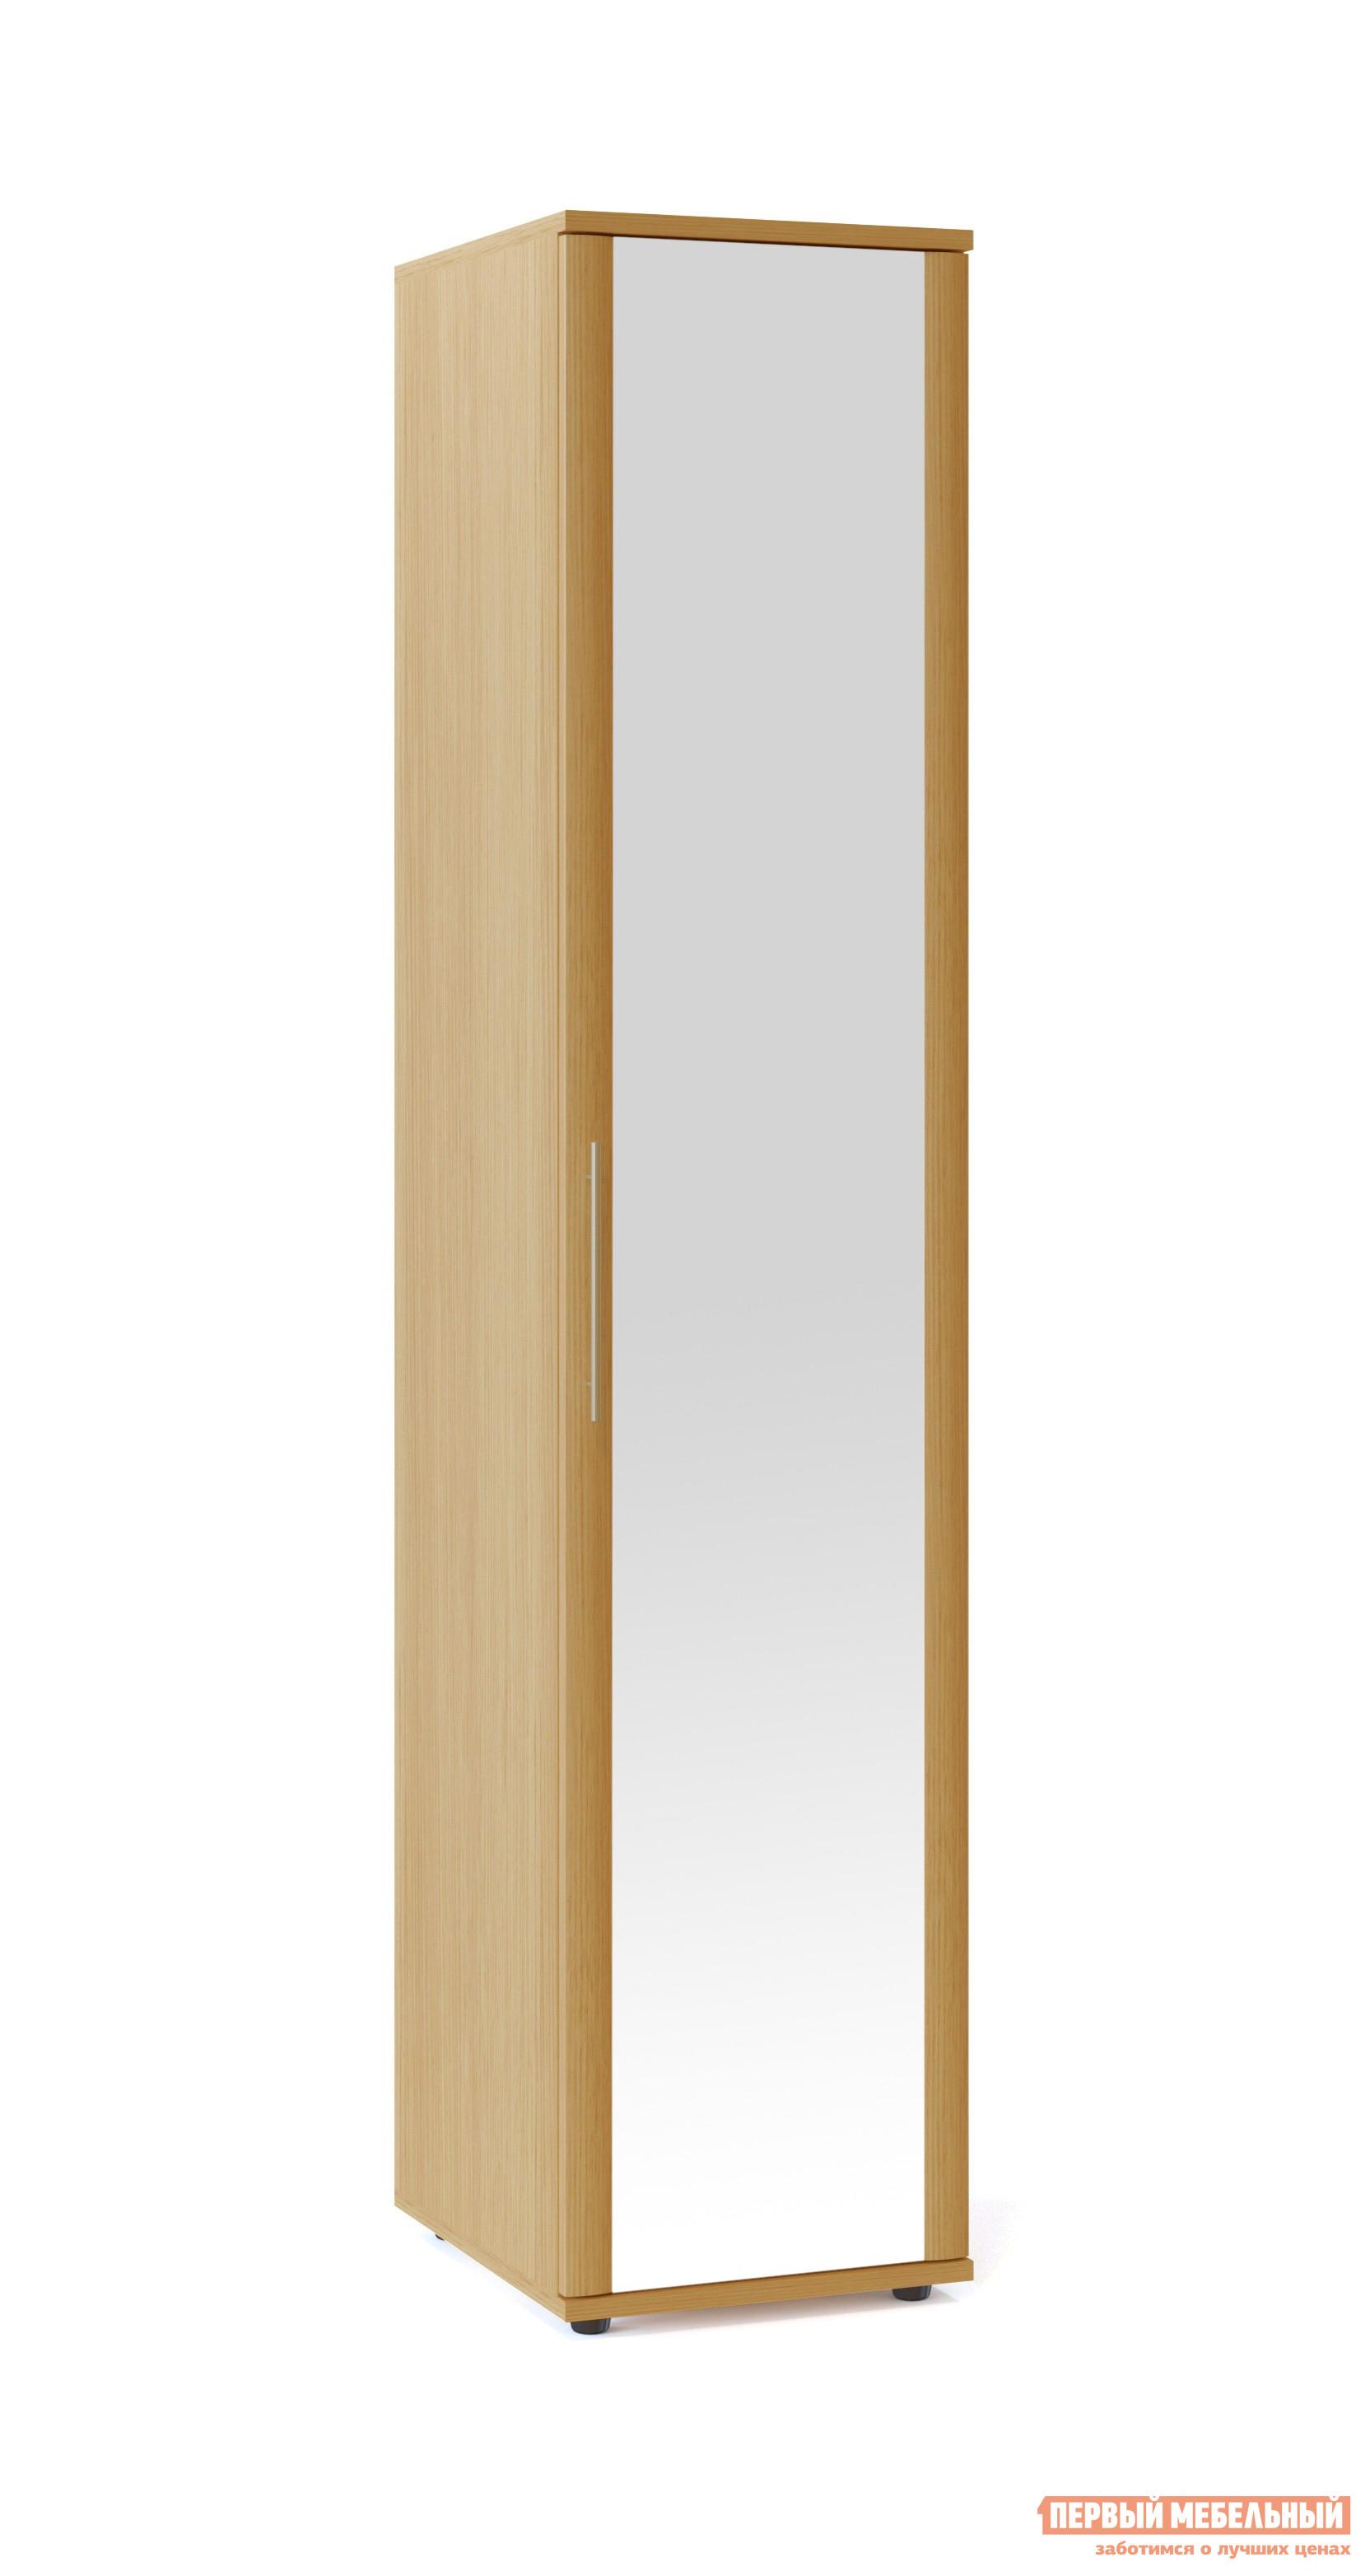 Шкаф распашной Сокол Маркес ШМ-205.1 Зеркало Ольха С, Правый